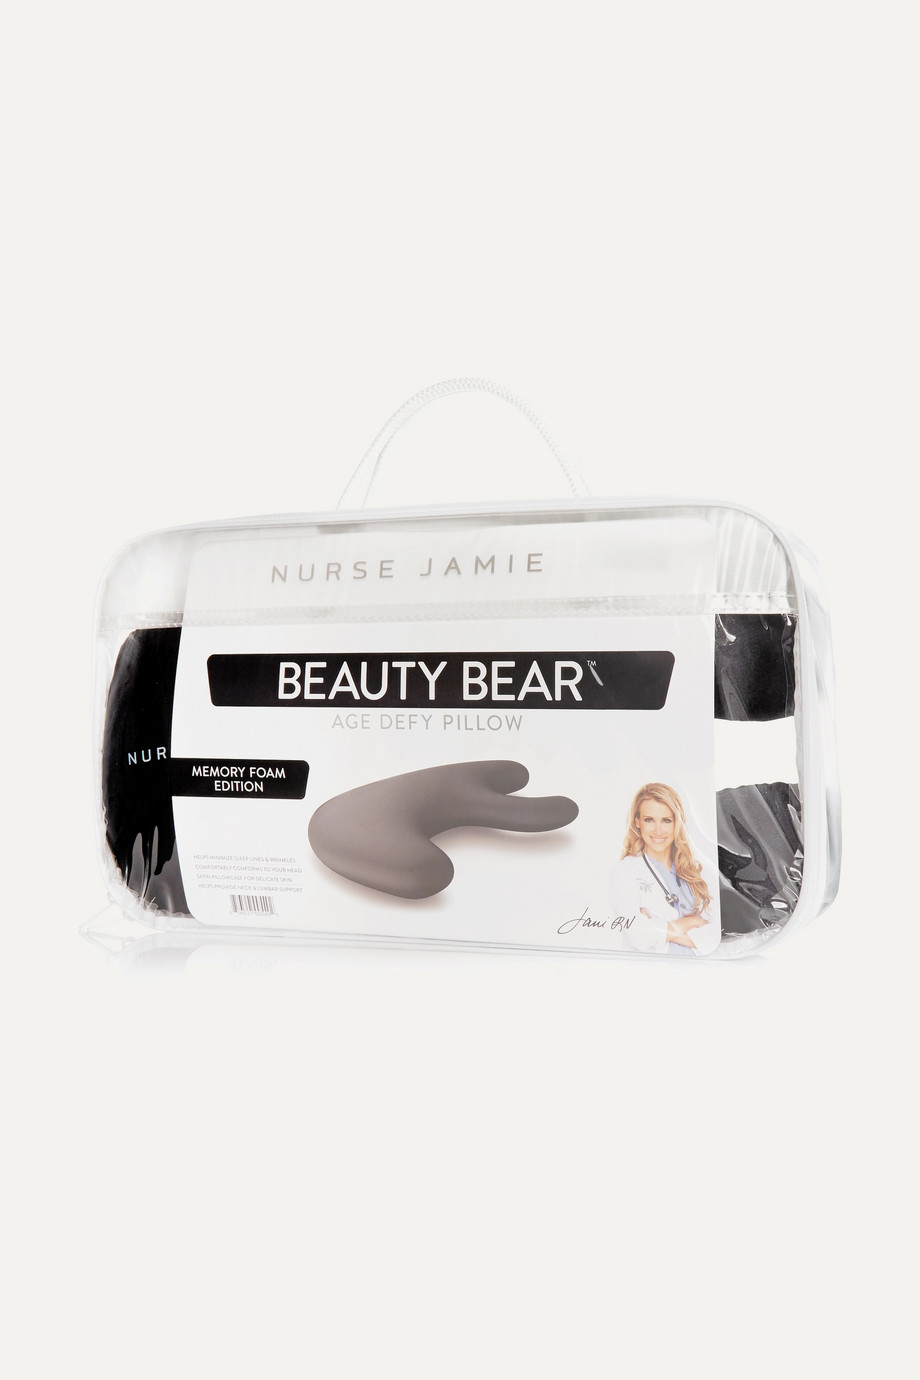 Nurse Jamie Beauty Bear 驻颜枕头(记忆海绵)